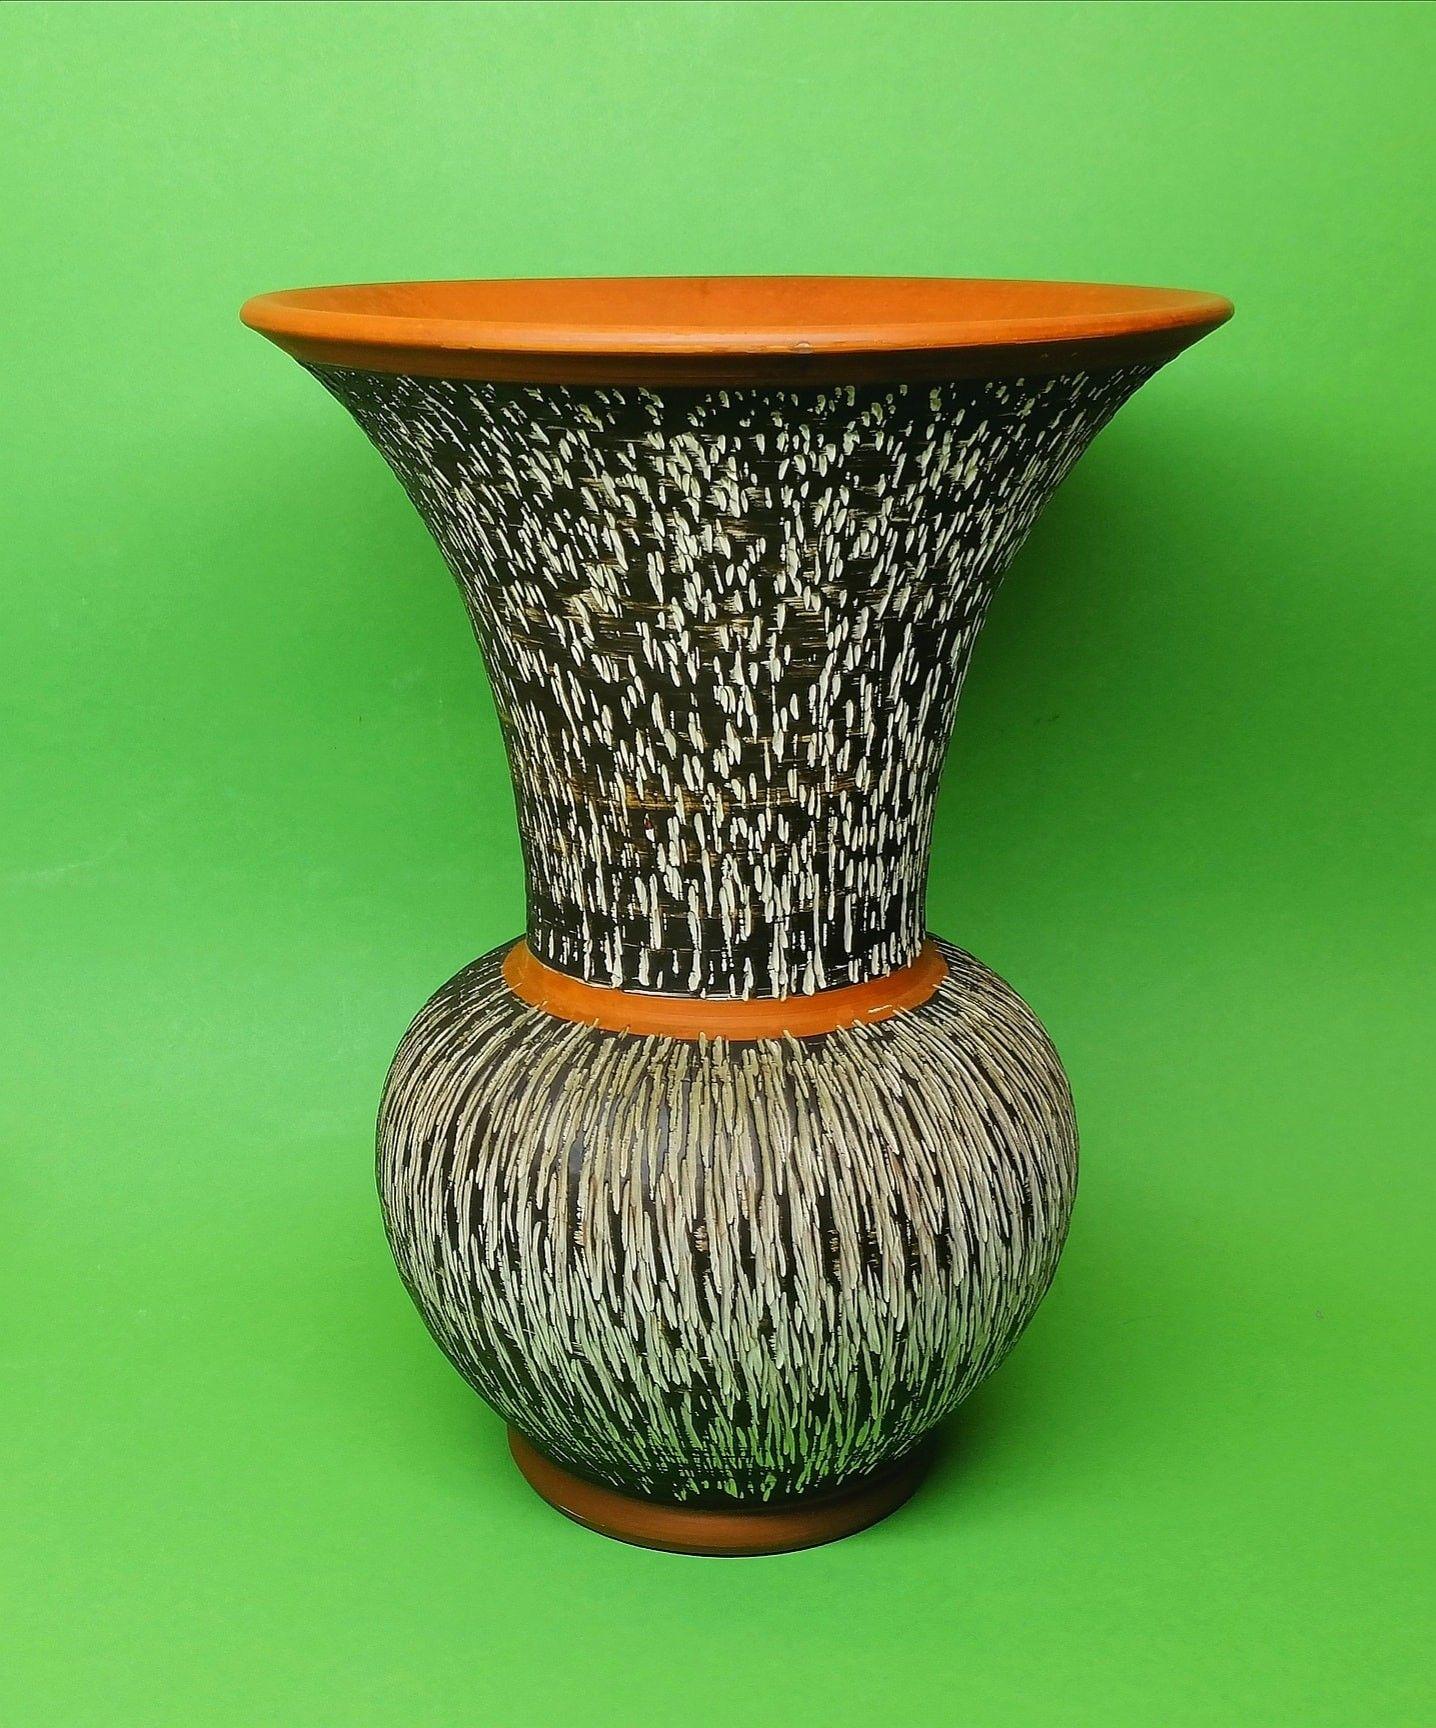 Mad Mouse Antique Porcelain ✳️ mad-mouse.nl   Unique Large Vase   Tulip Bulb Shape   Earthenware Pottery   Germany1950's  Excellent Condition   Handcrafted  #MadMouseAntiquePorcelain   #germanpottery #ceramicjug #handcrafted #vintagevase #tulip #vase #vaso #ceramicvase #florero #porcelain #porzellan #antiqueporcelain #kabin #ceramic #ceramics #pottery #antiques #oldporcelain #oldpottery #porcelaine #porcellana #porcelana #potteryart #potterylife